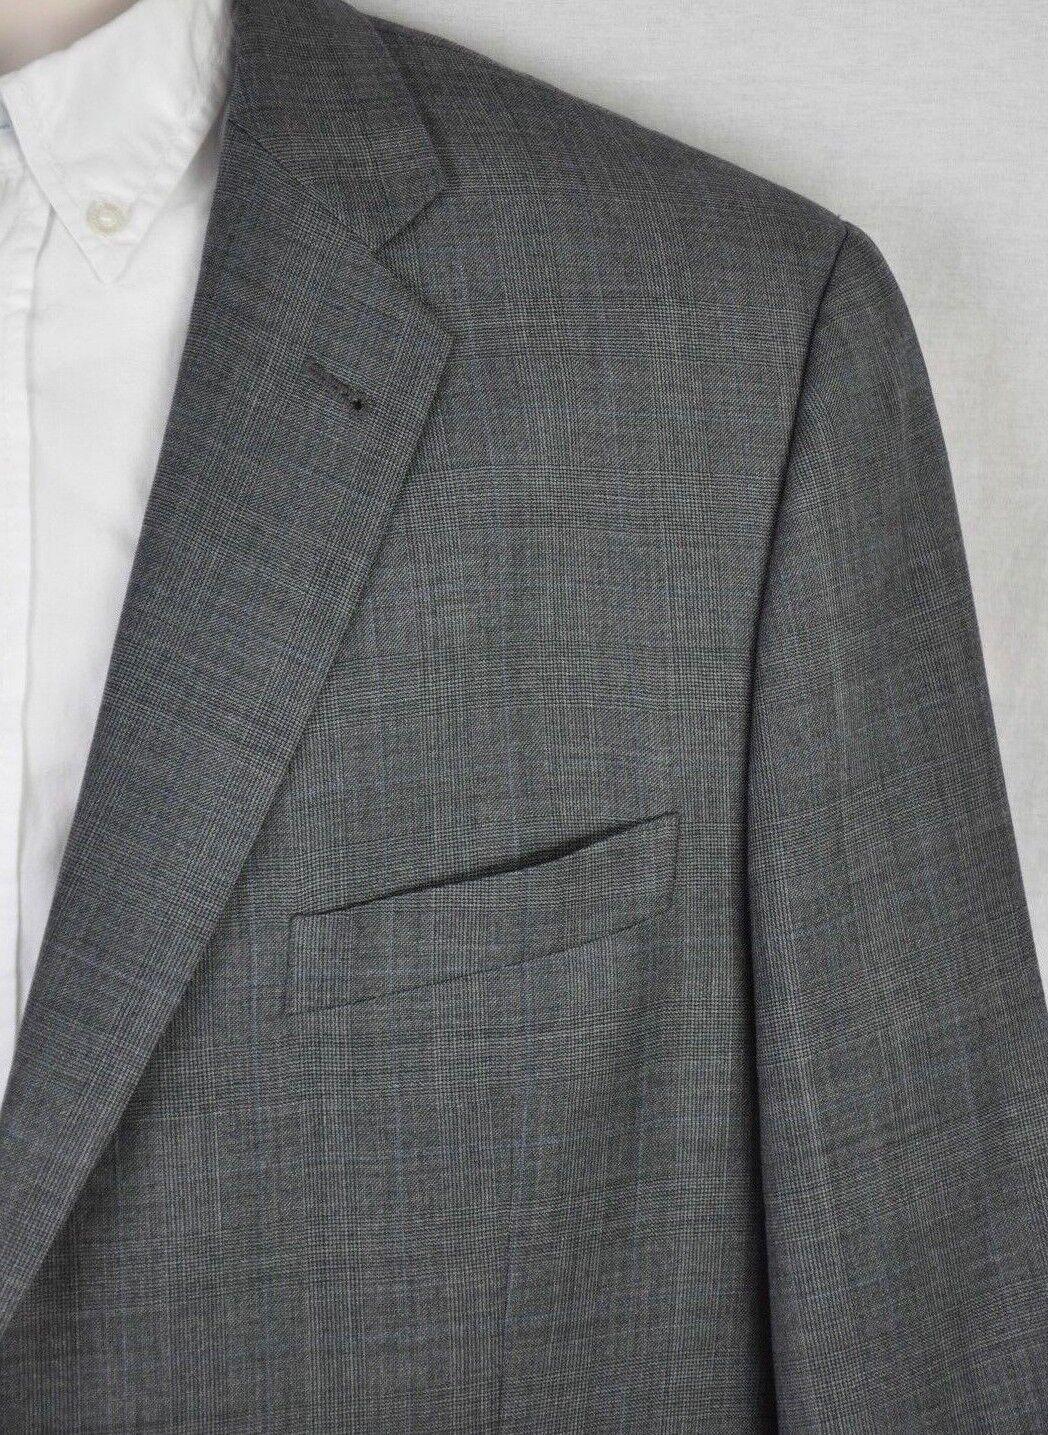 46R Joseph Abboud Nordstrom Blk bluee Plaid Super120s Wool 2Btn 2Vent Blazer USA